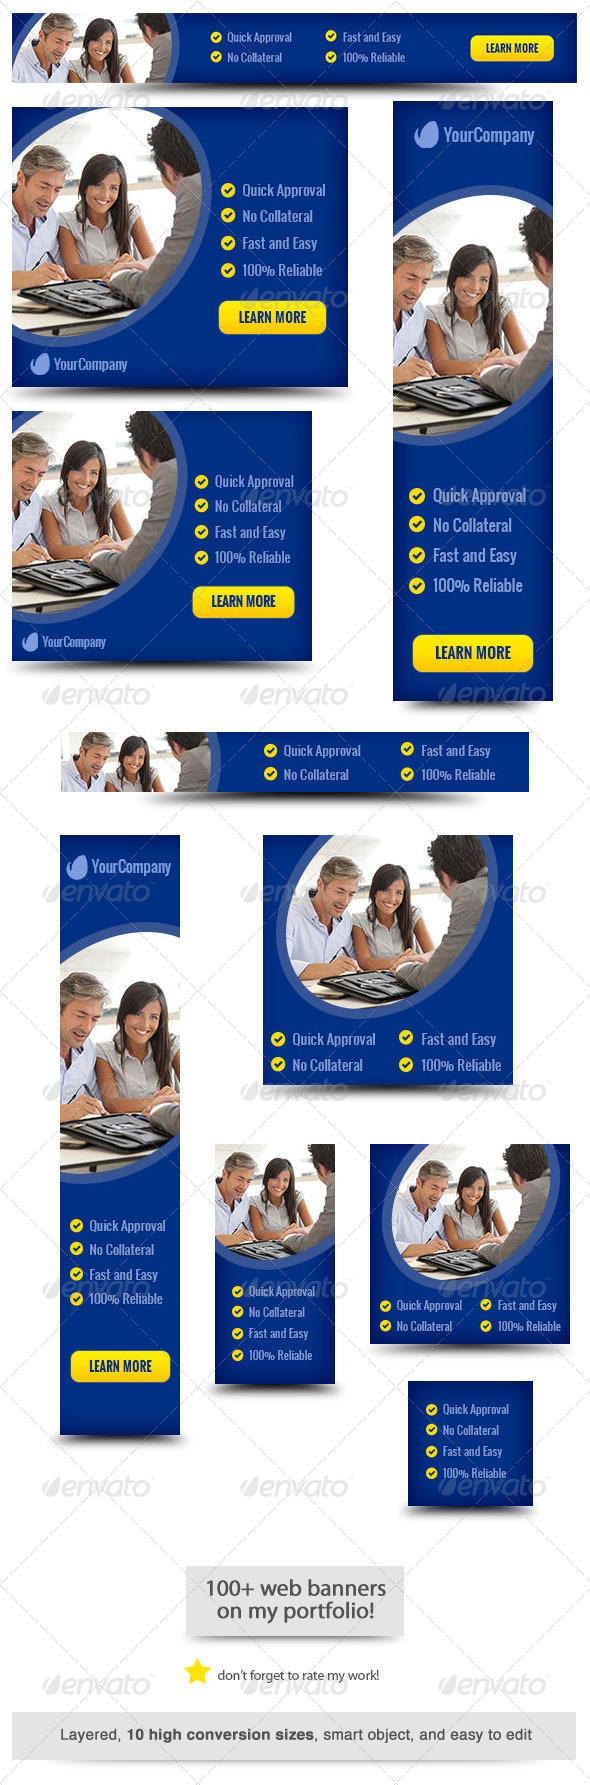 GraphicRiver Business Loan Web Banner Design 6583025